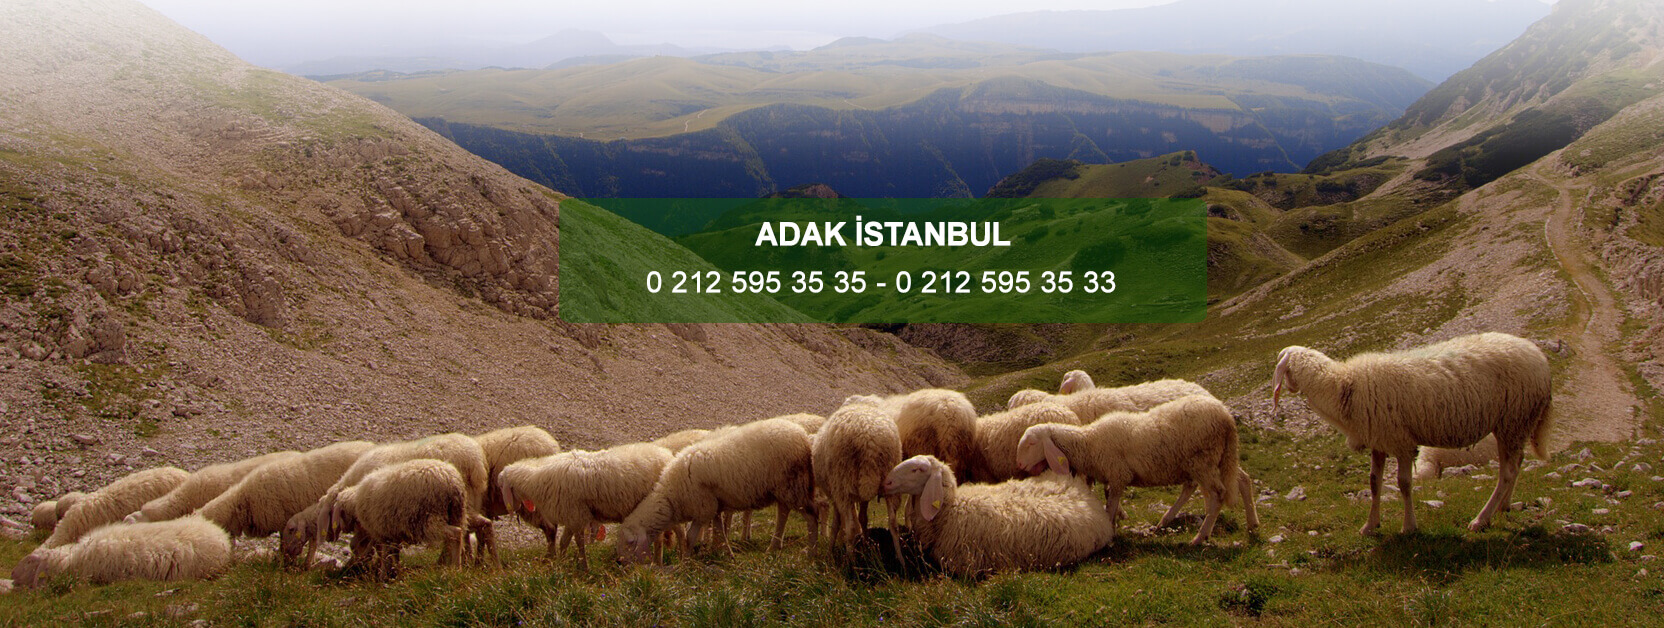 Adak İstanbul